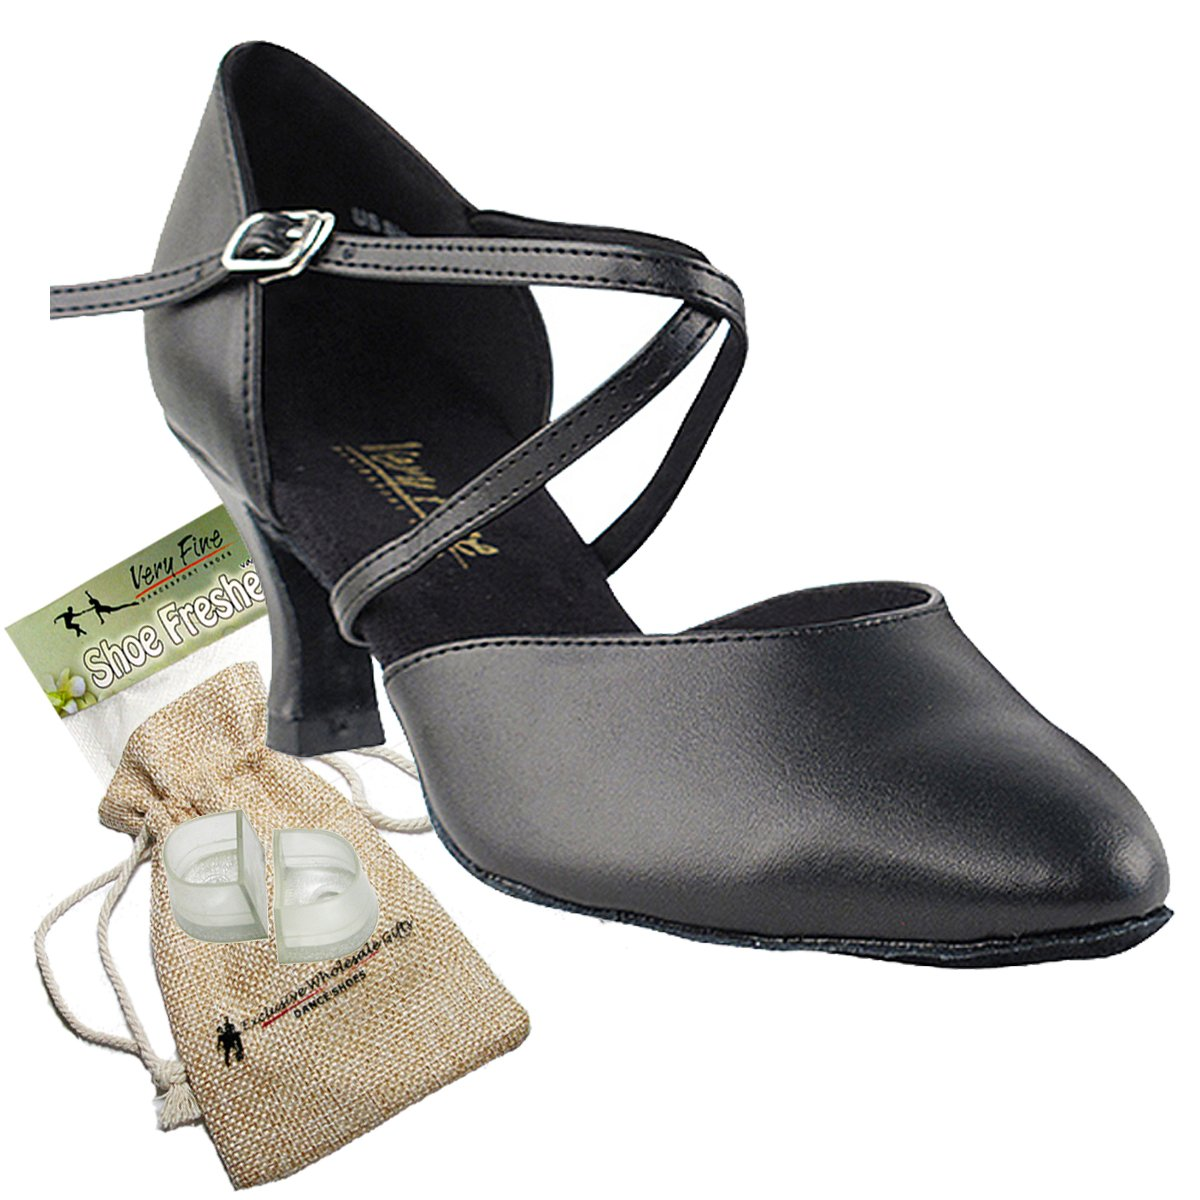 Women's Ballroom Dance Shoes Tango Wedding Salsa Dance Shoes Black Leather 9691EB Comfortable - Very Fine 2.5'' Heel 9 M US [Bundle 5]